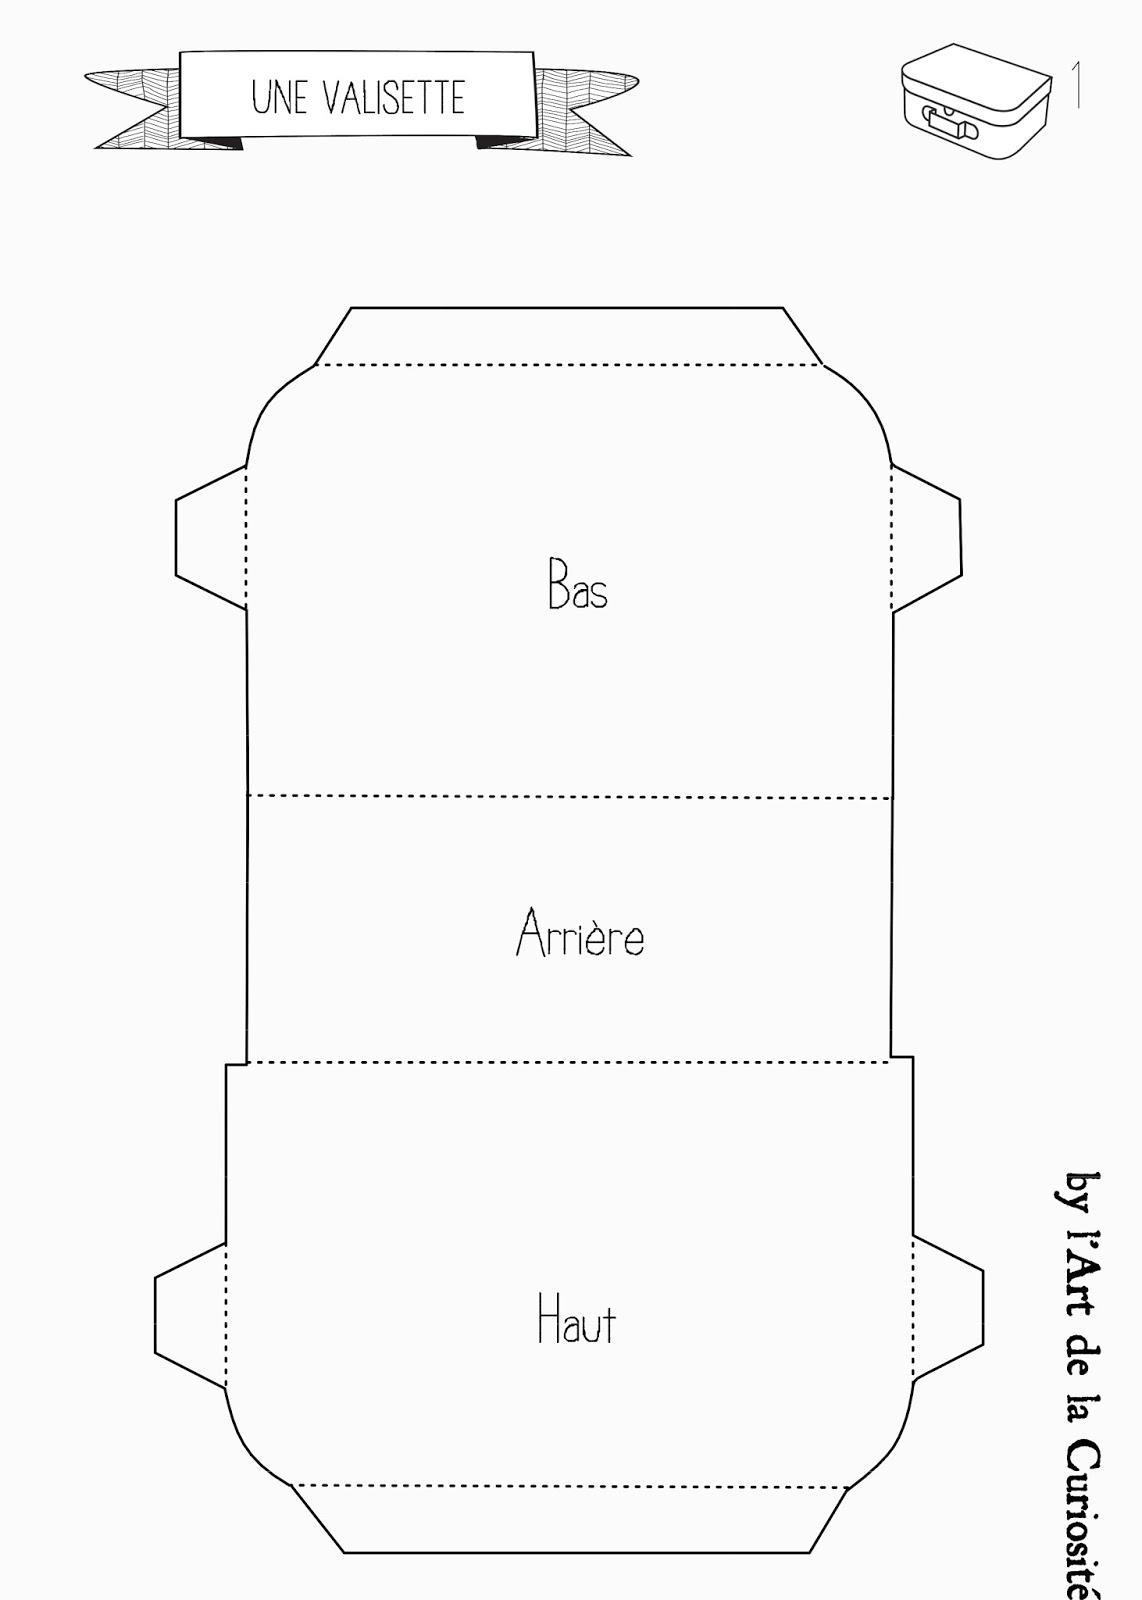 Küchendesign-logo daniela camargo darrudacamargo on pinterest